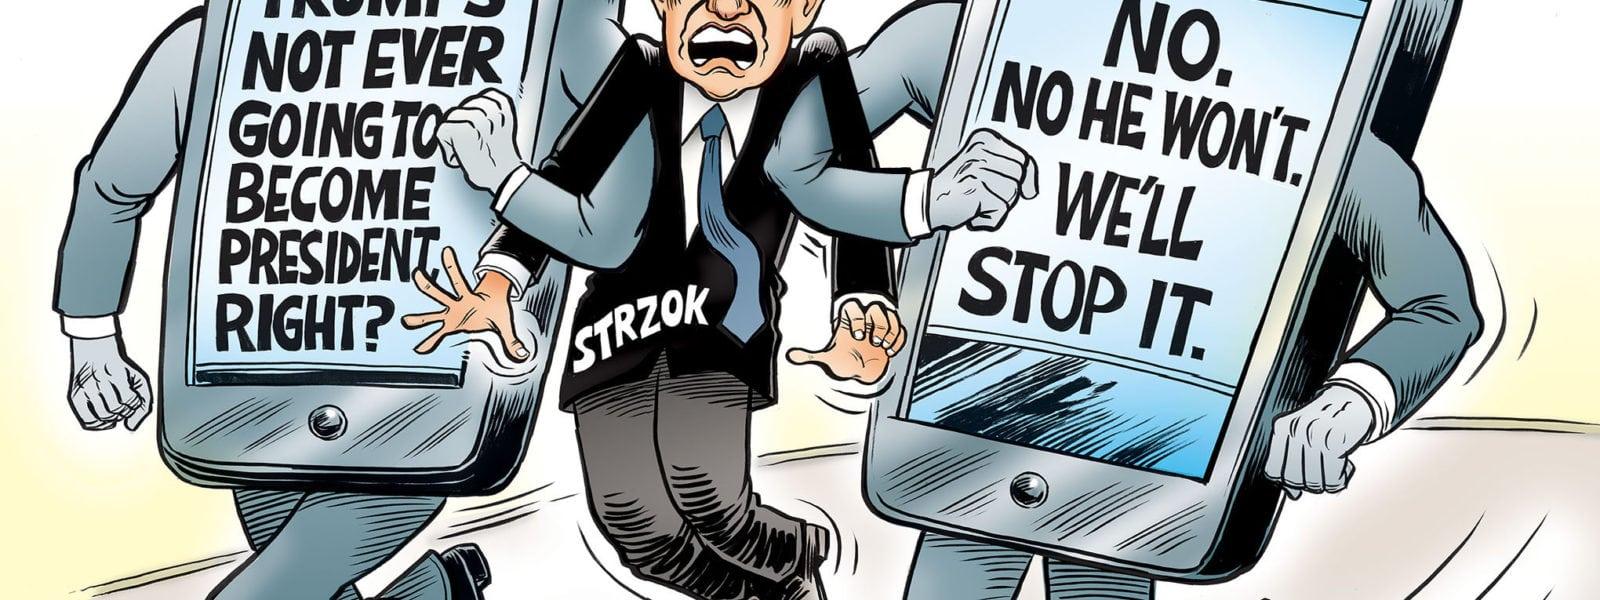 Peter Strzok Has Left The Building